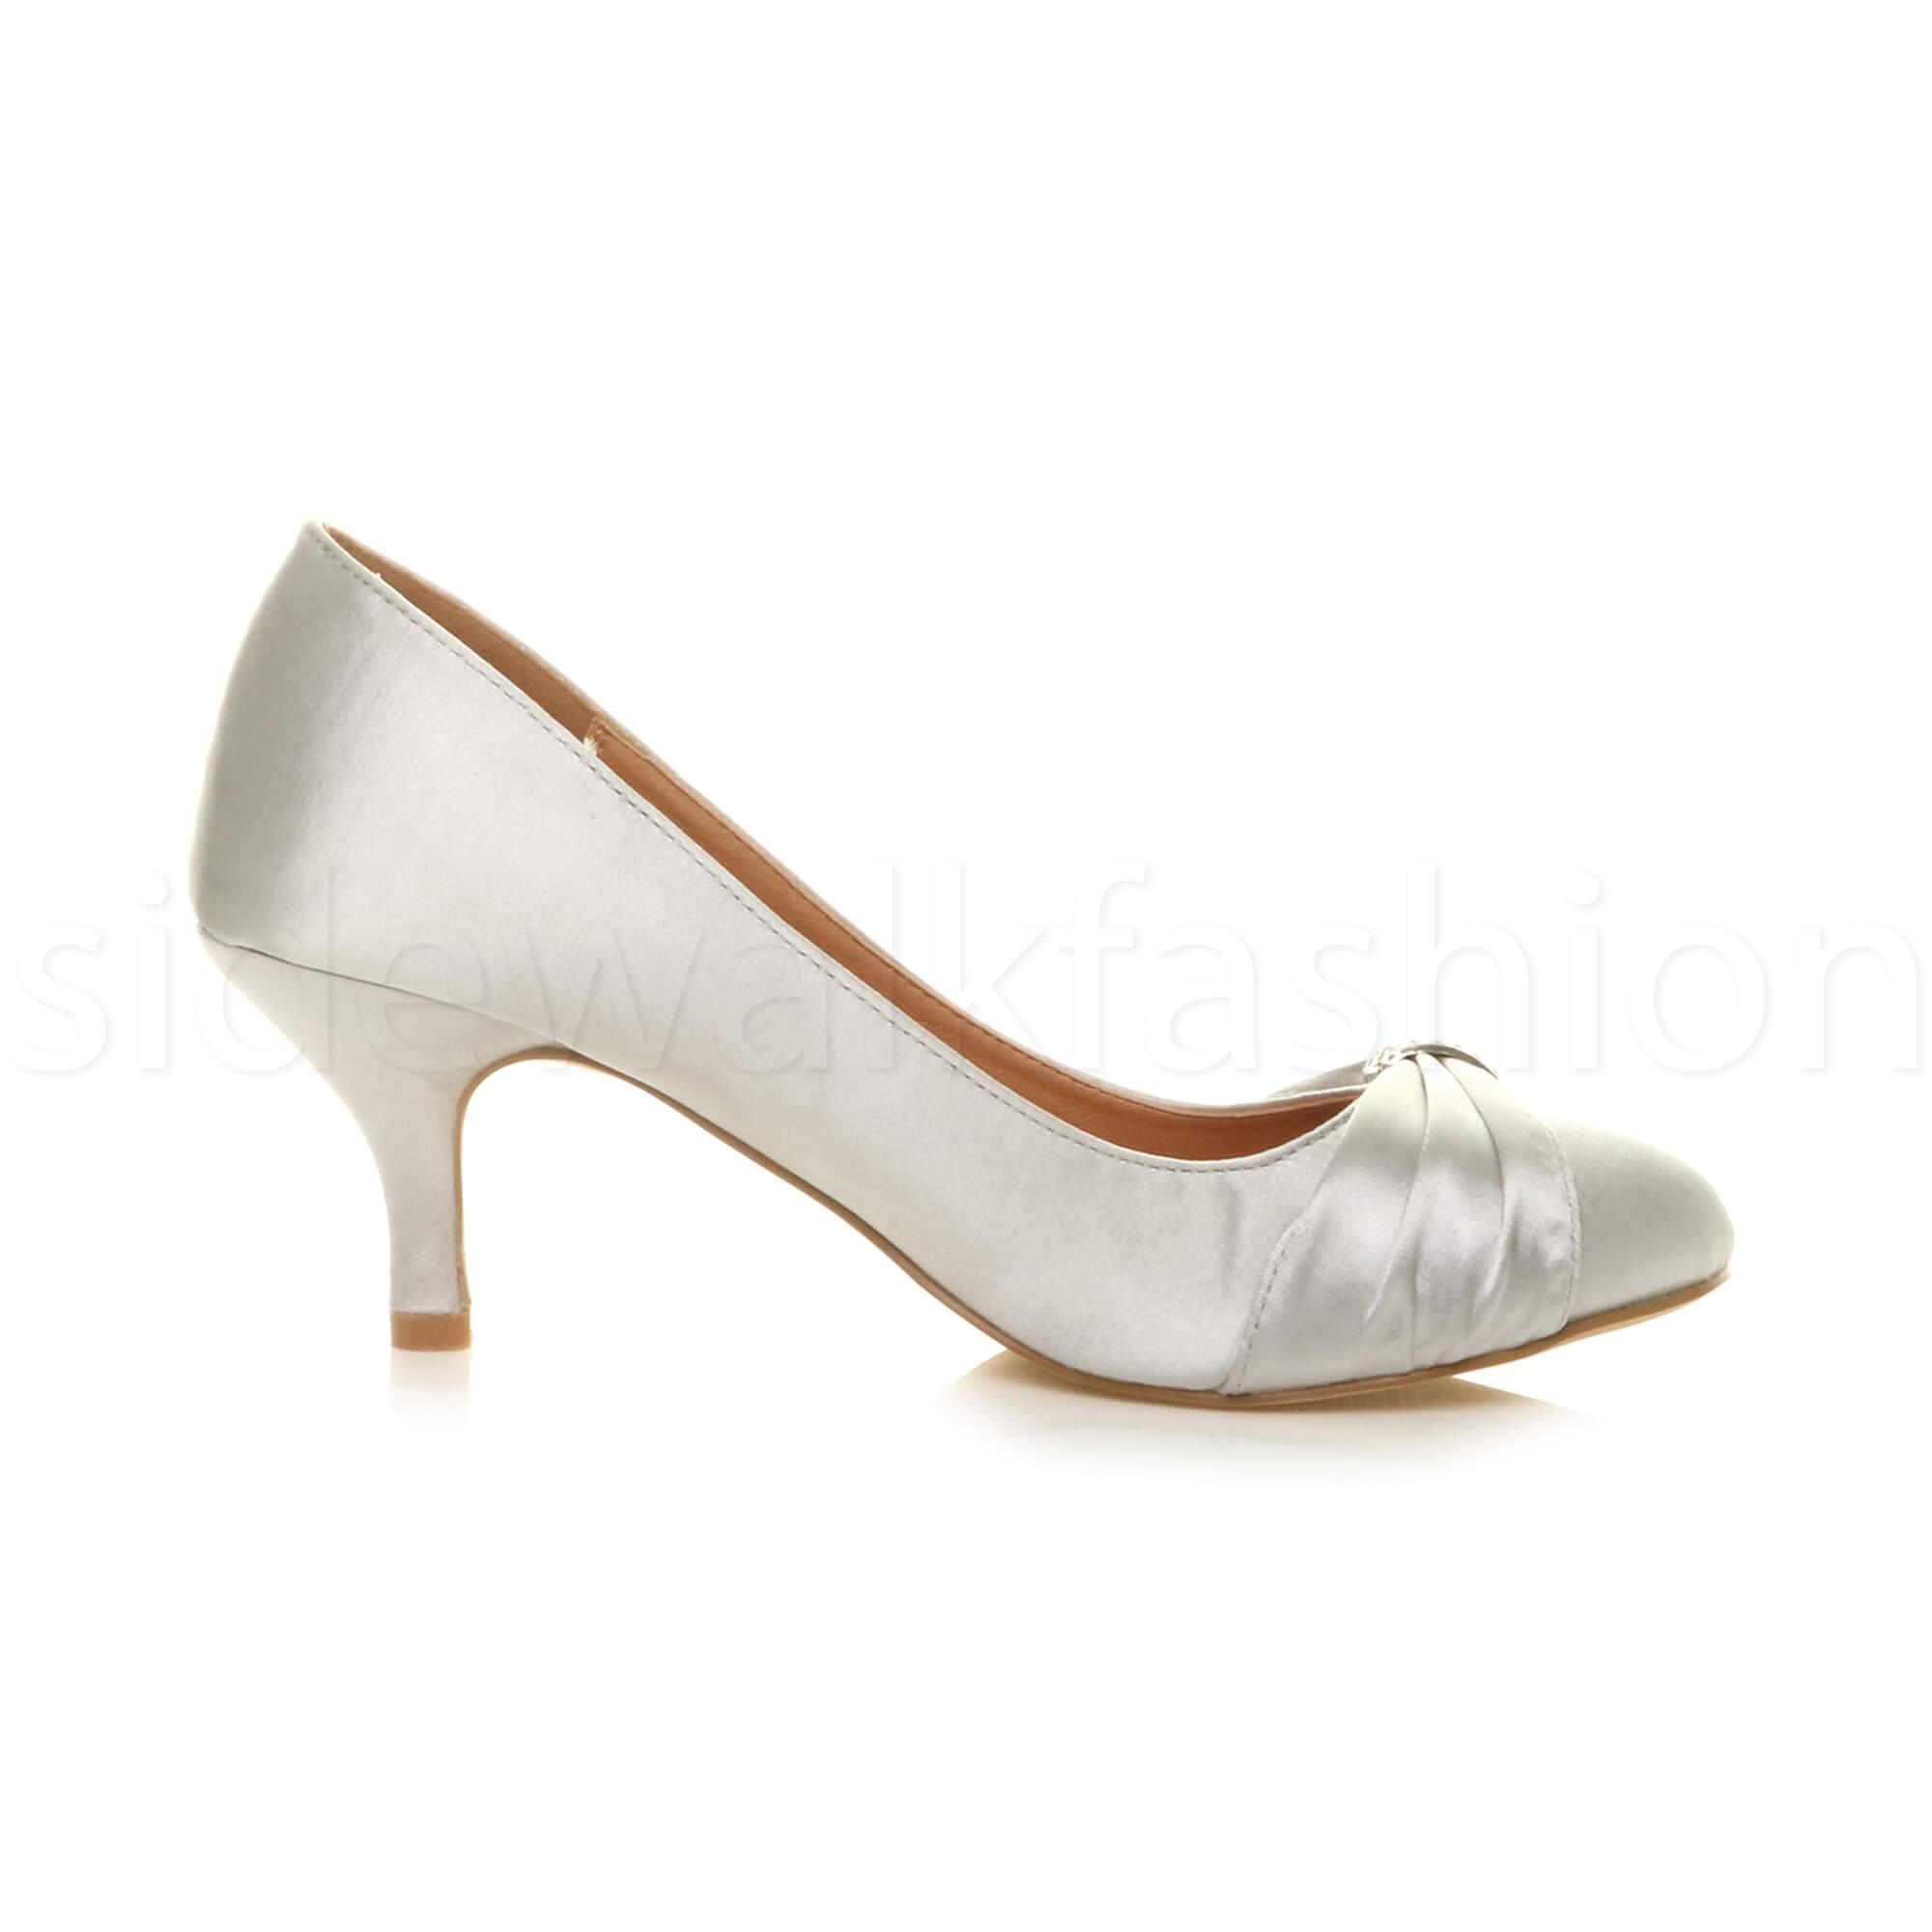 Womens-ladies-low-mid-heel-diamante-party-smart-evening-court-shoes-size thumbnail 92